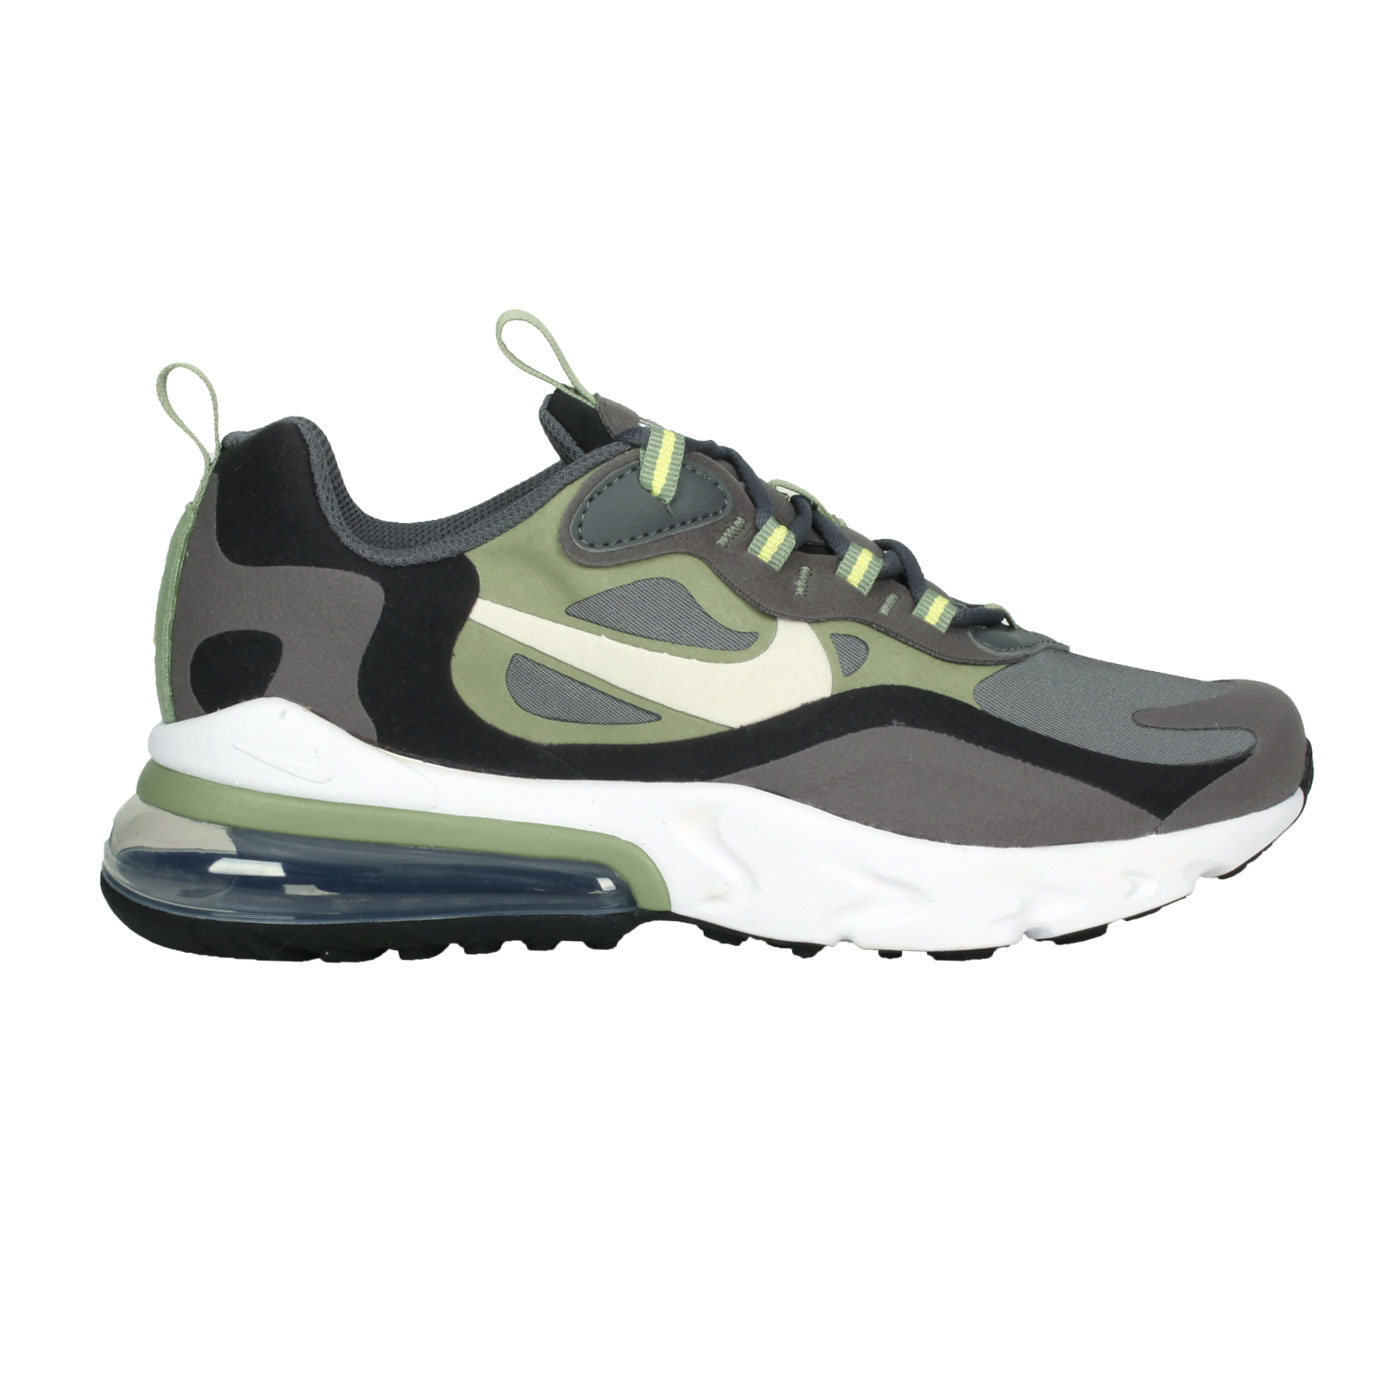 NIKE 大童氣墊休閒運動鞋  @AIR MZX 270 REACT (GS)@BQ0103022 - 灰黑綠